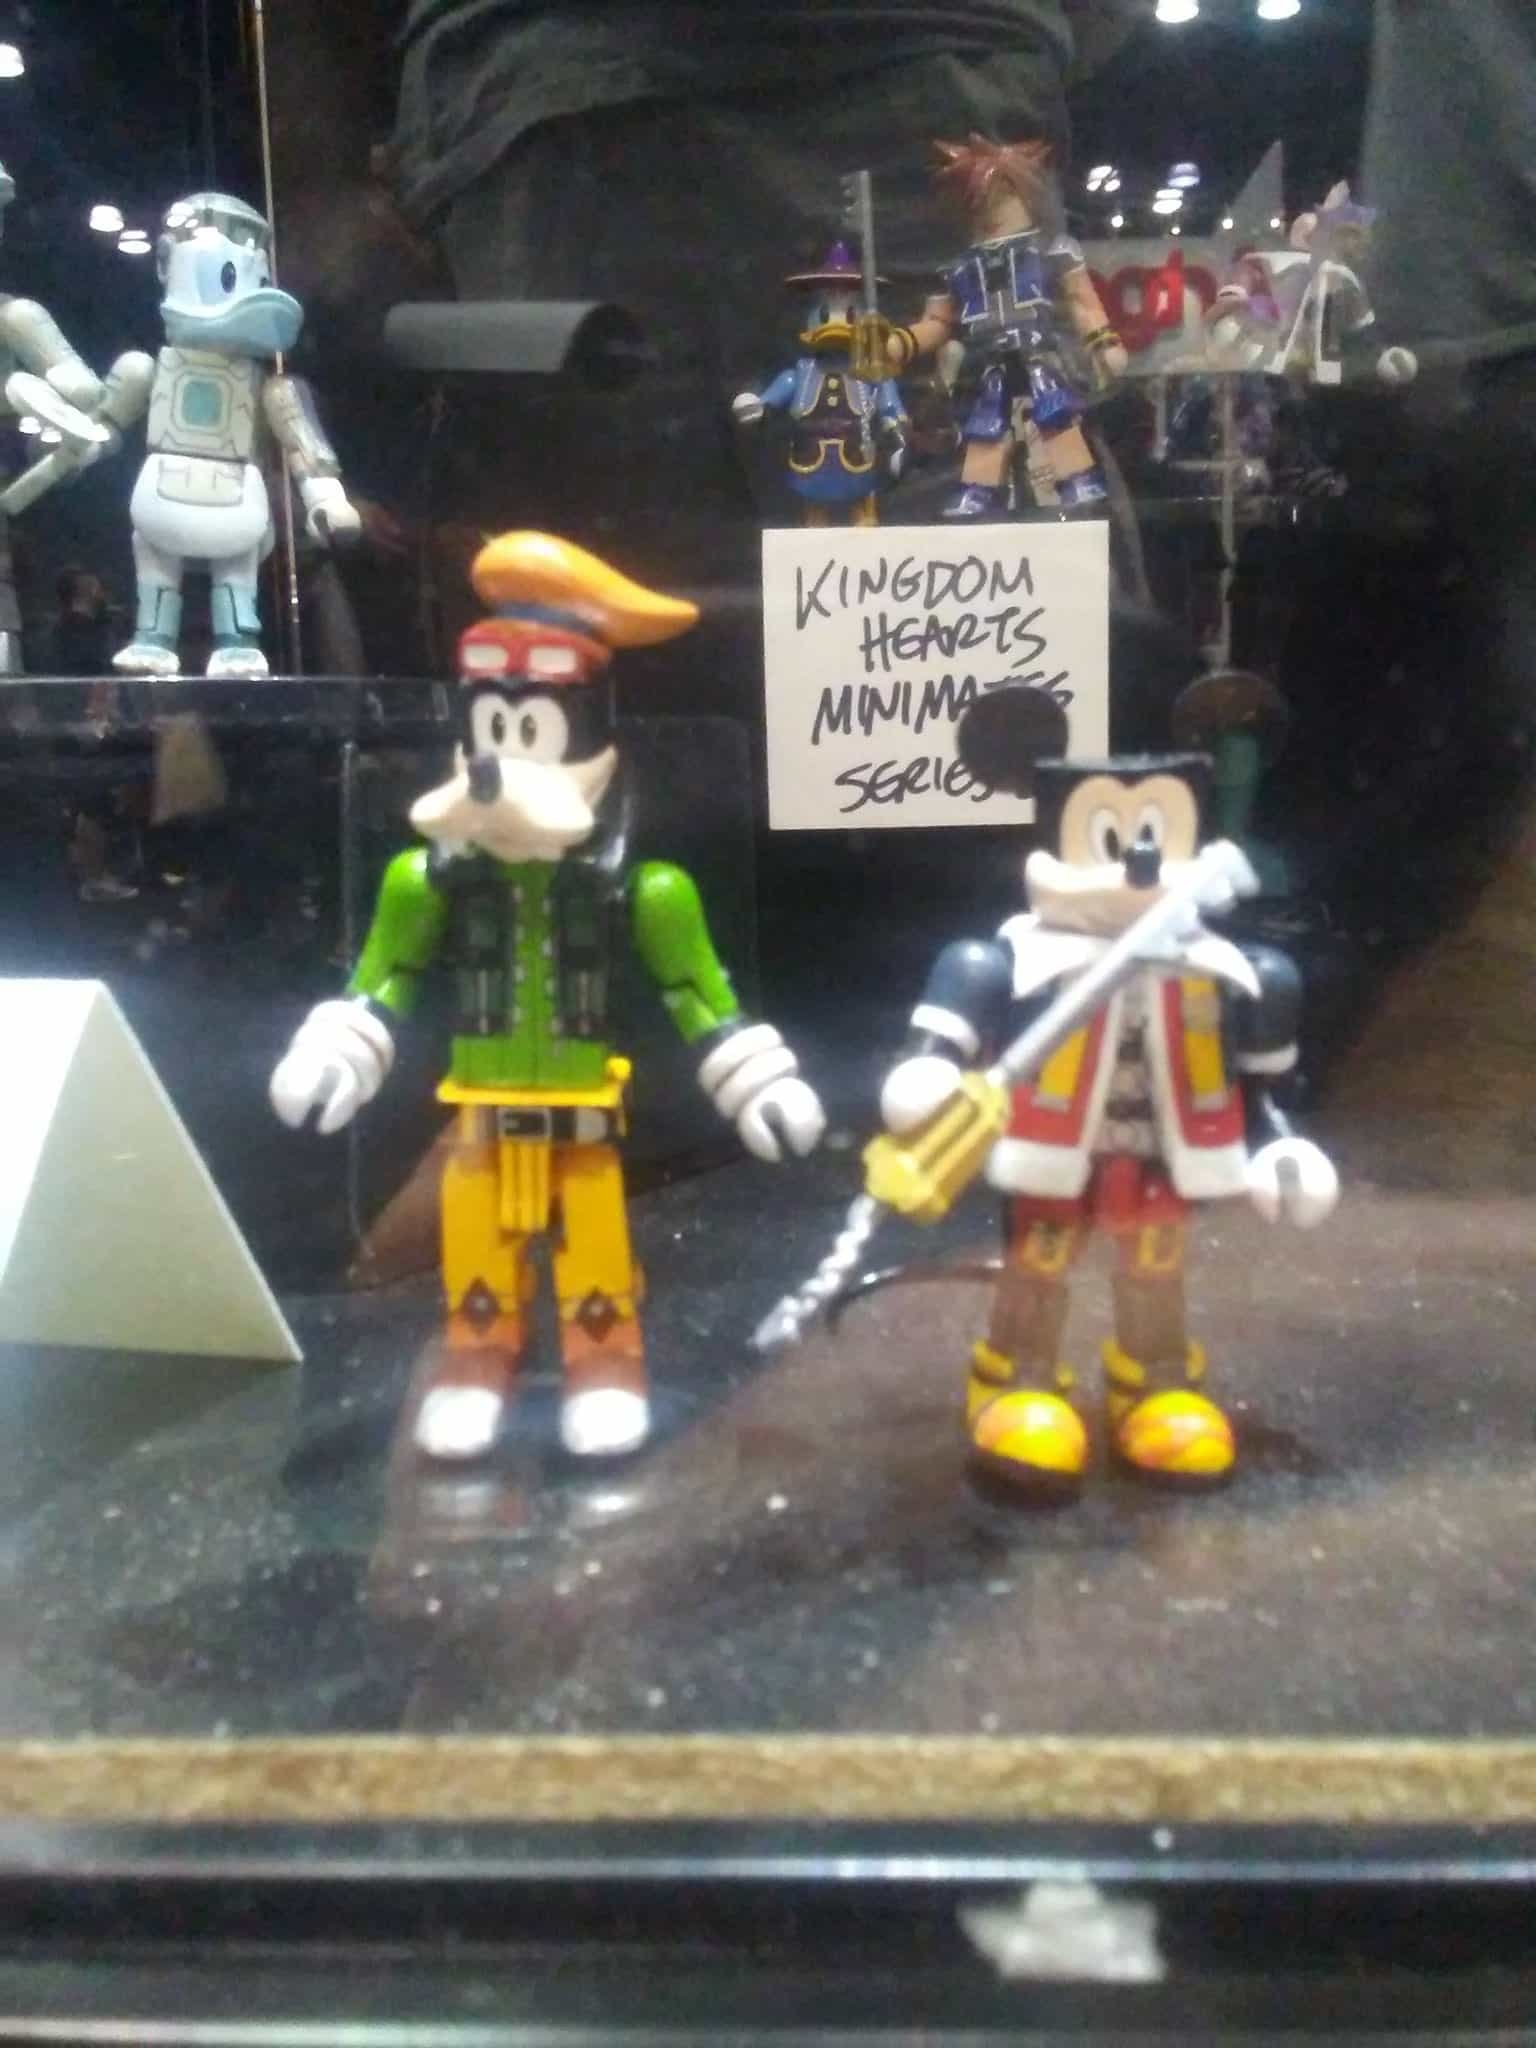 Kingdom Hearts Minimates Coming Soon Diskingdom Com